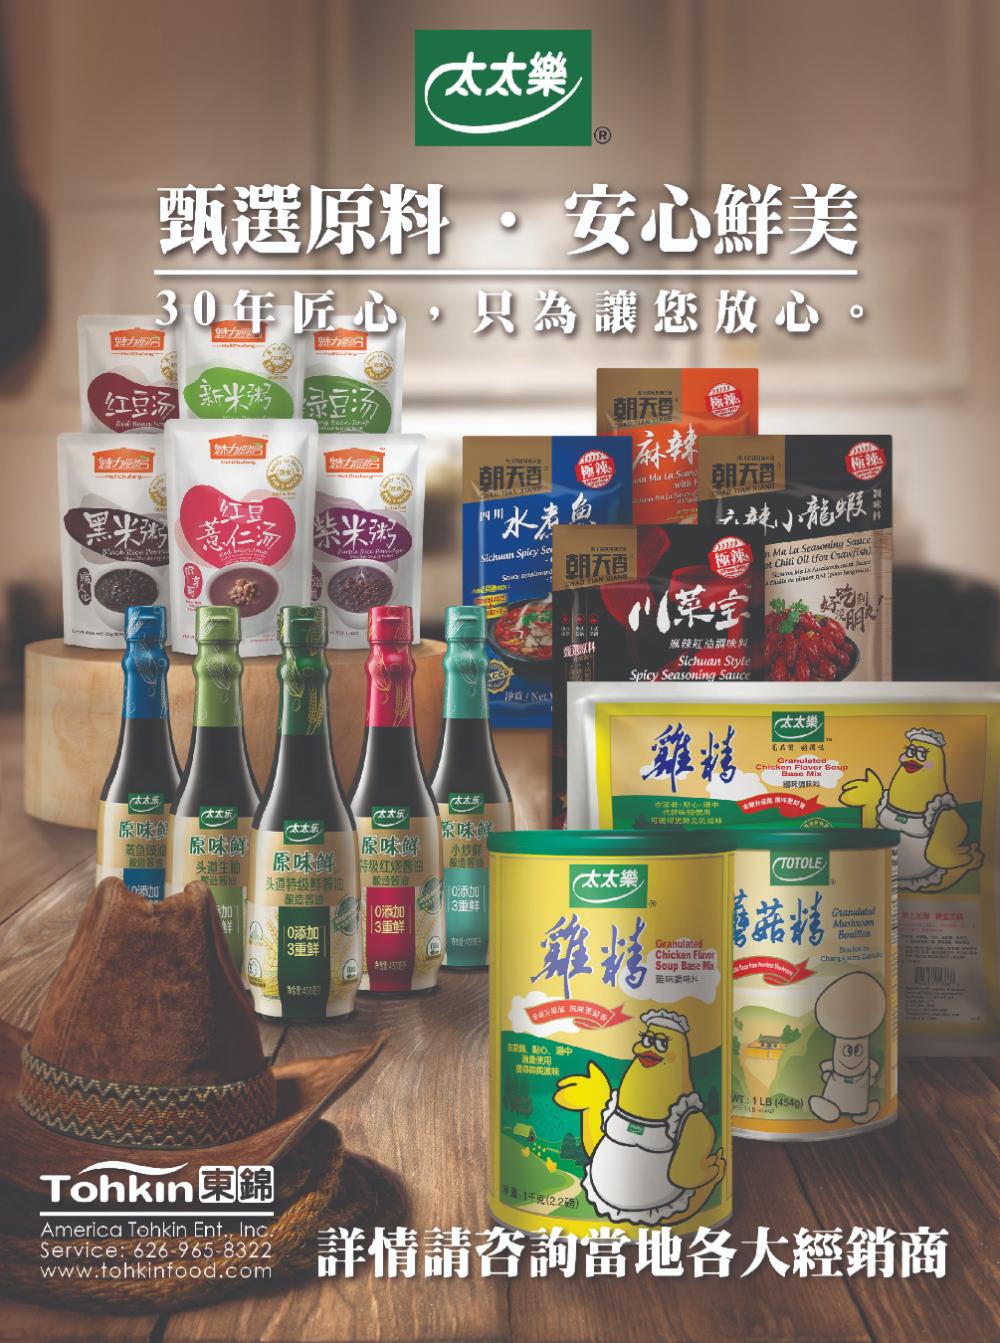 AMERICA TOHKIN ENTERPRISES 東錦食品批發公司